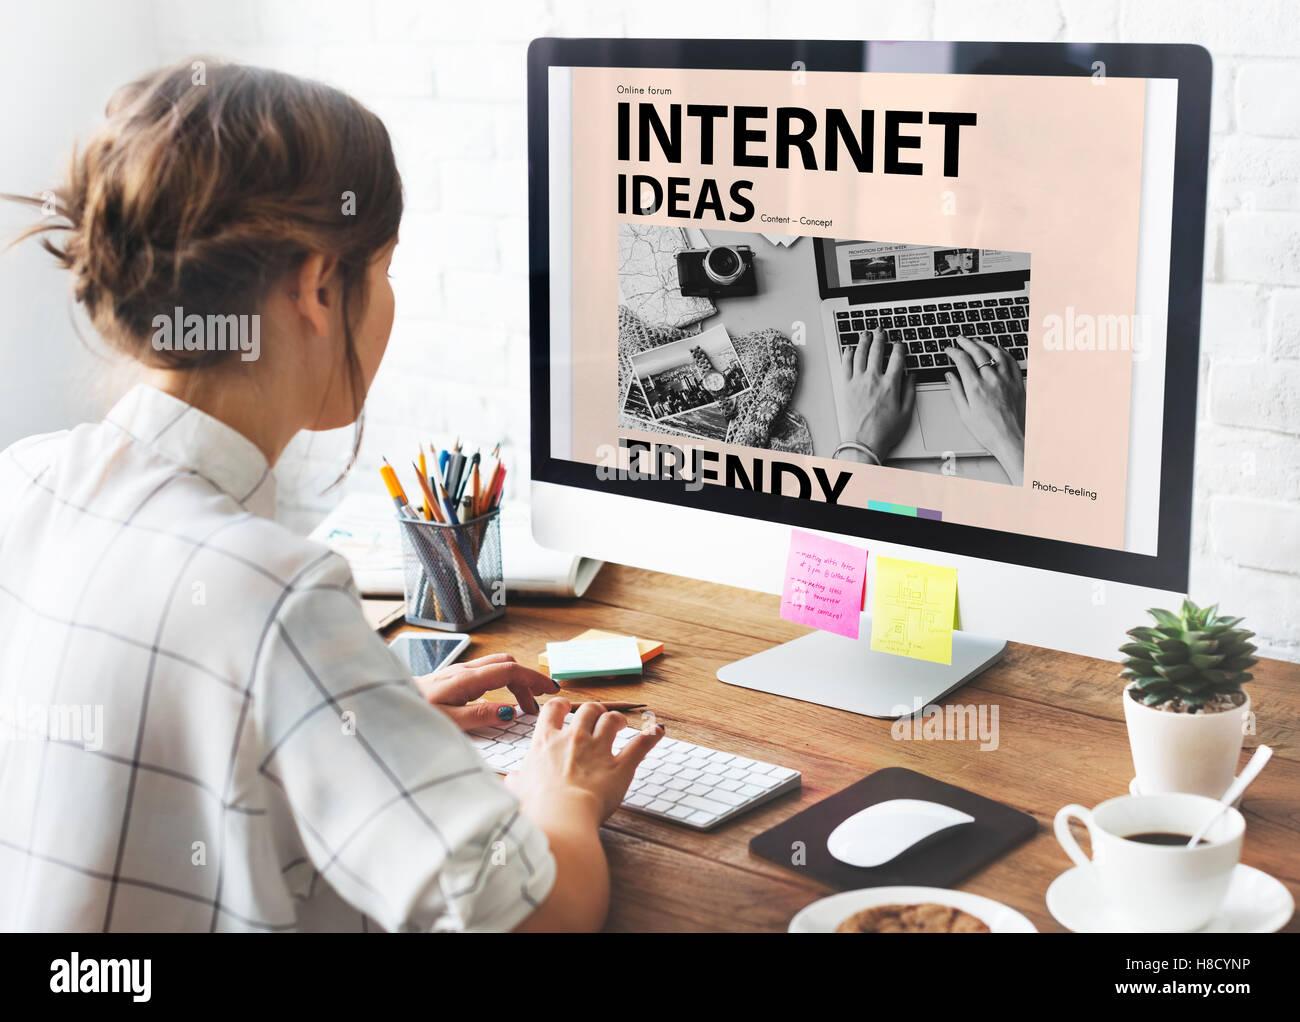 Social Media Blog Ideas Concept - Stock Image